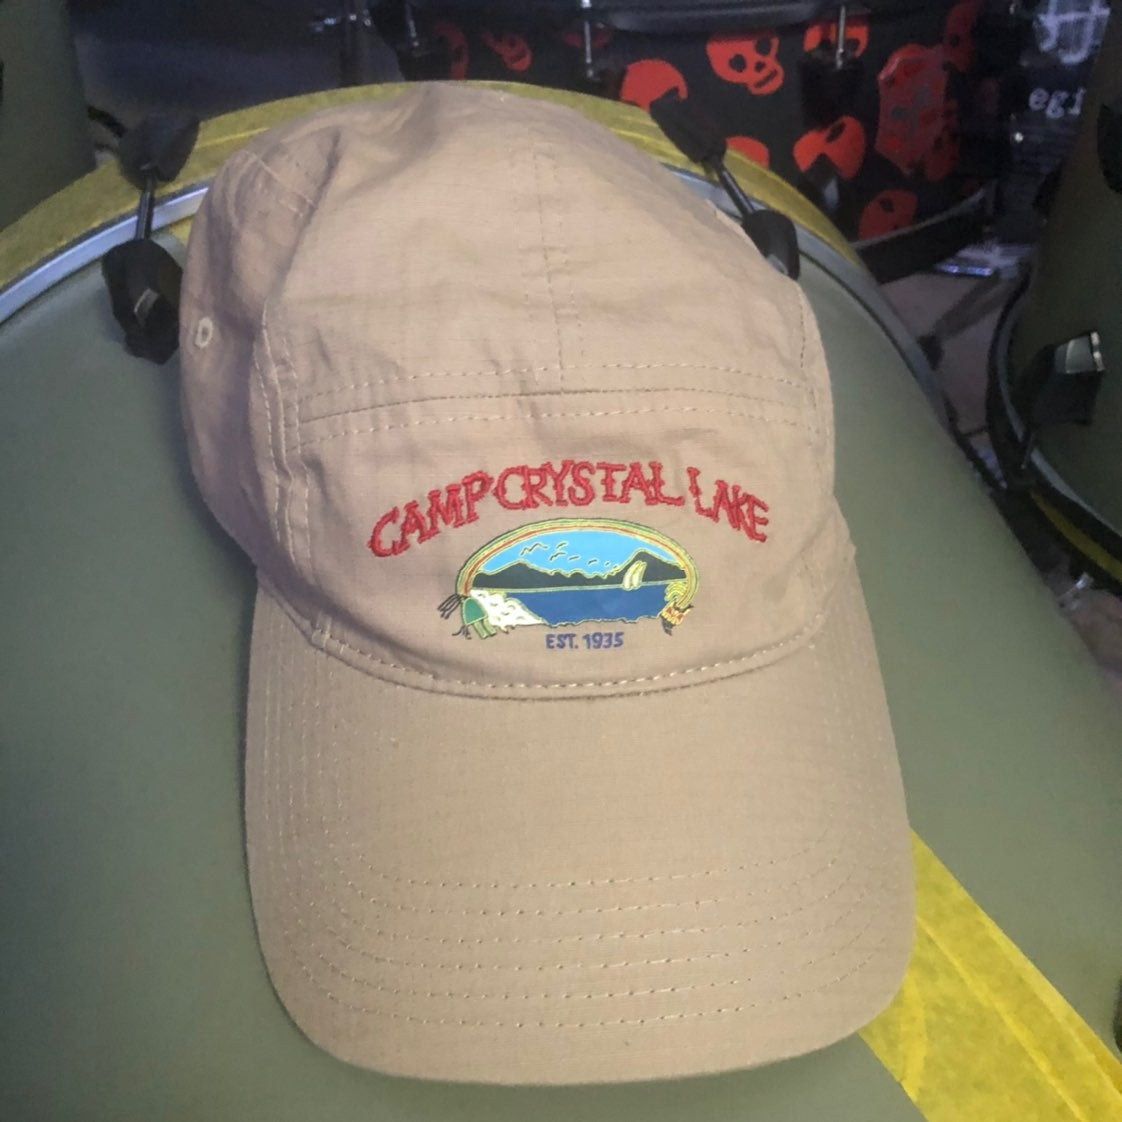 camp crystal lake adjustable cap